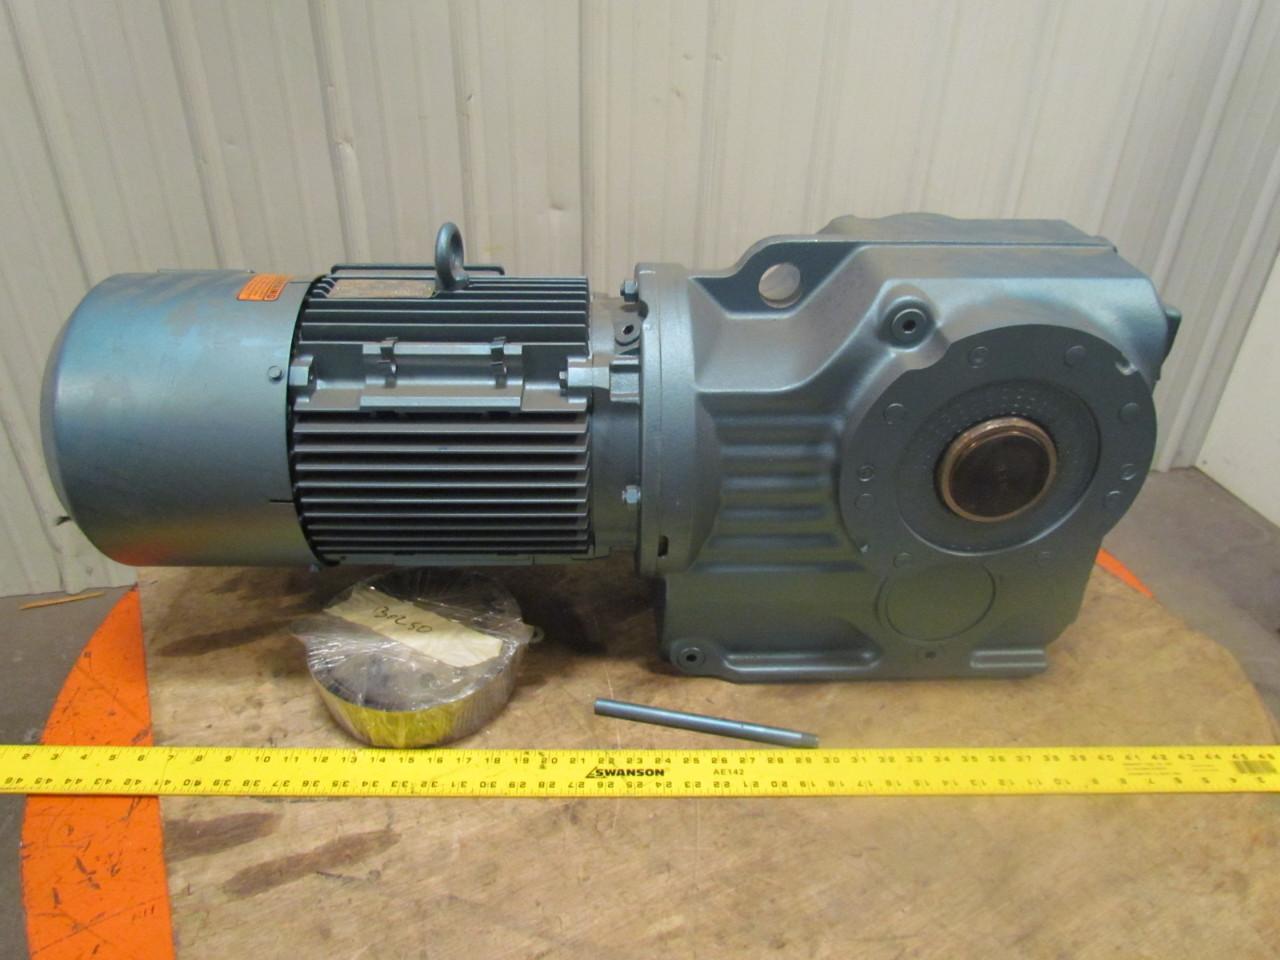 Sew Eurodrive Dfv132m8 4bm15hr Motor Gearbox Speed Reducer